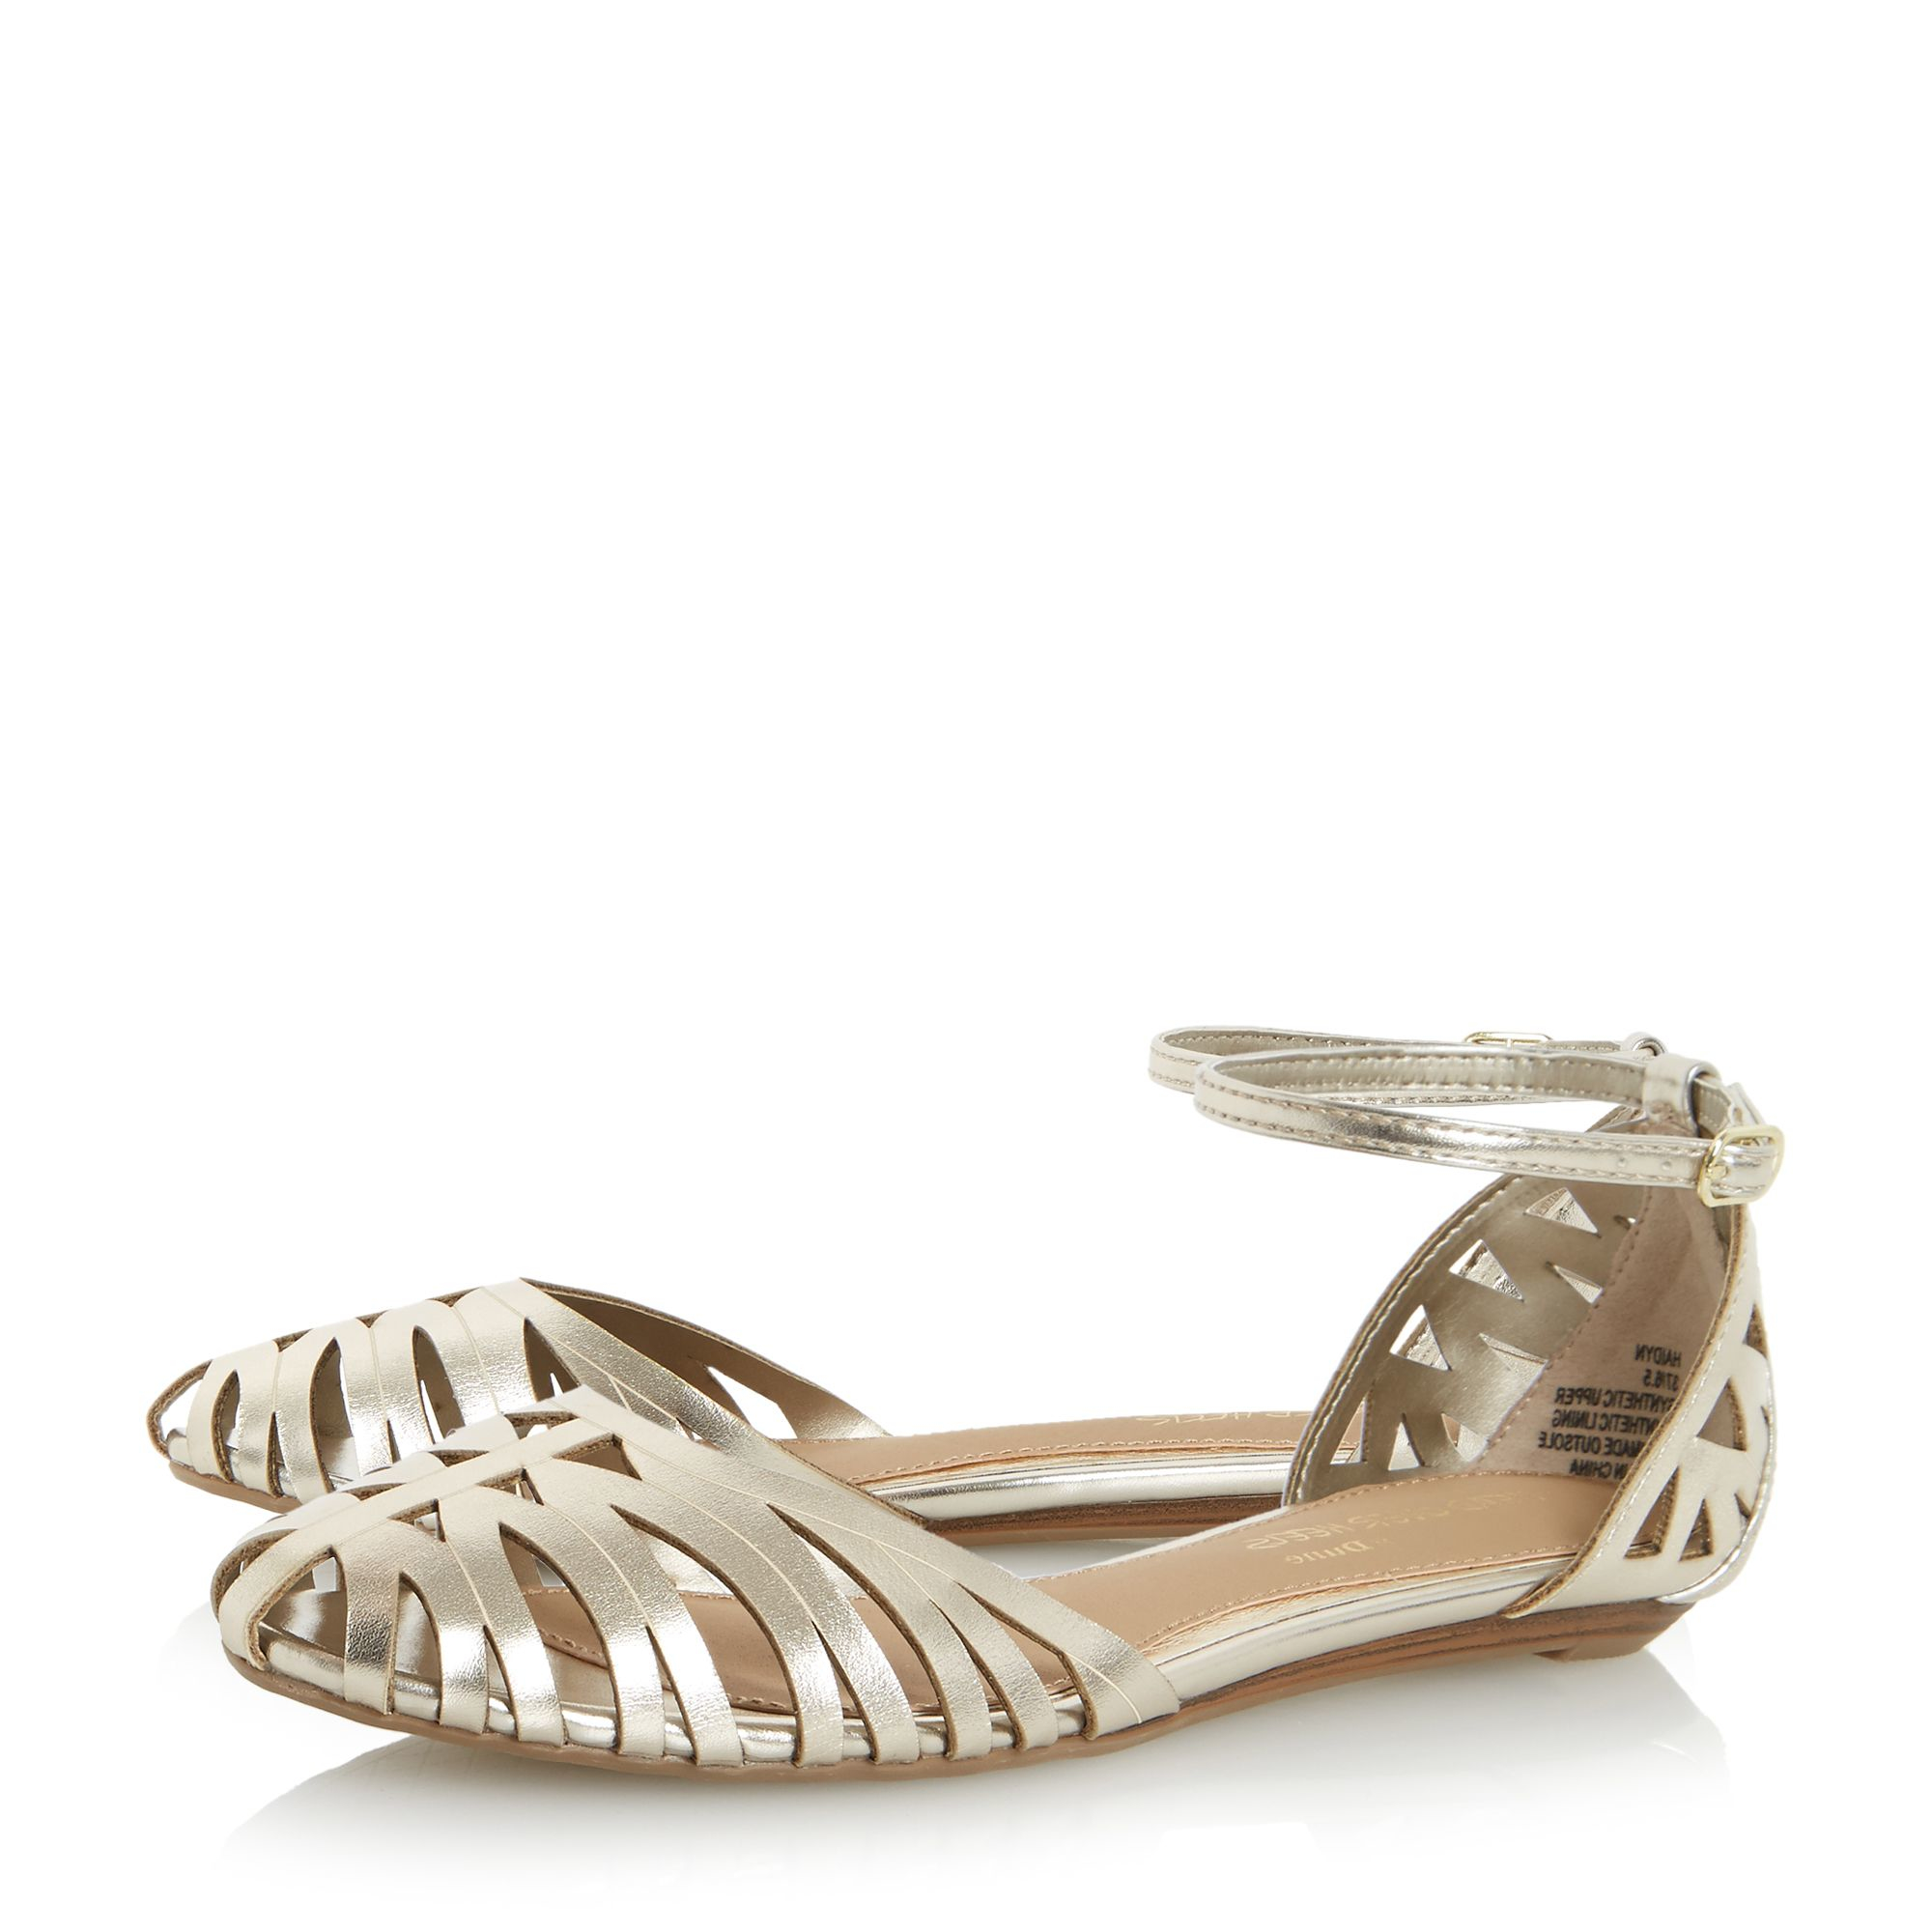 Kurt Geiger Shoes With Gold Round Heels